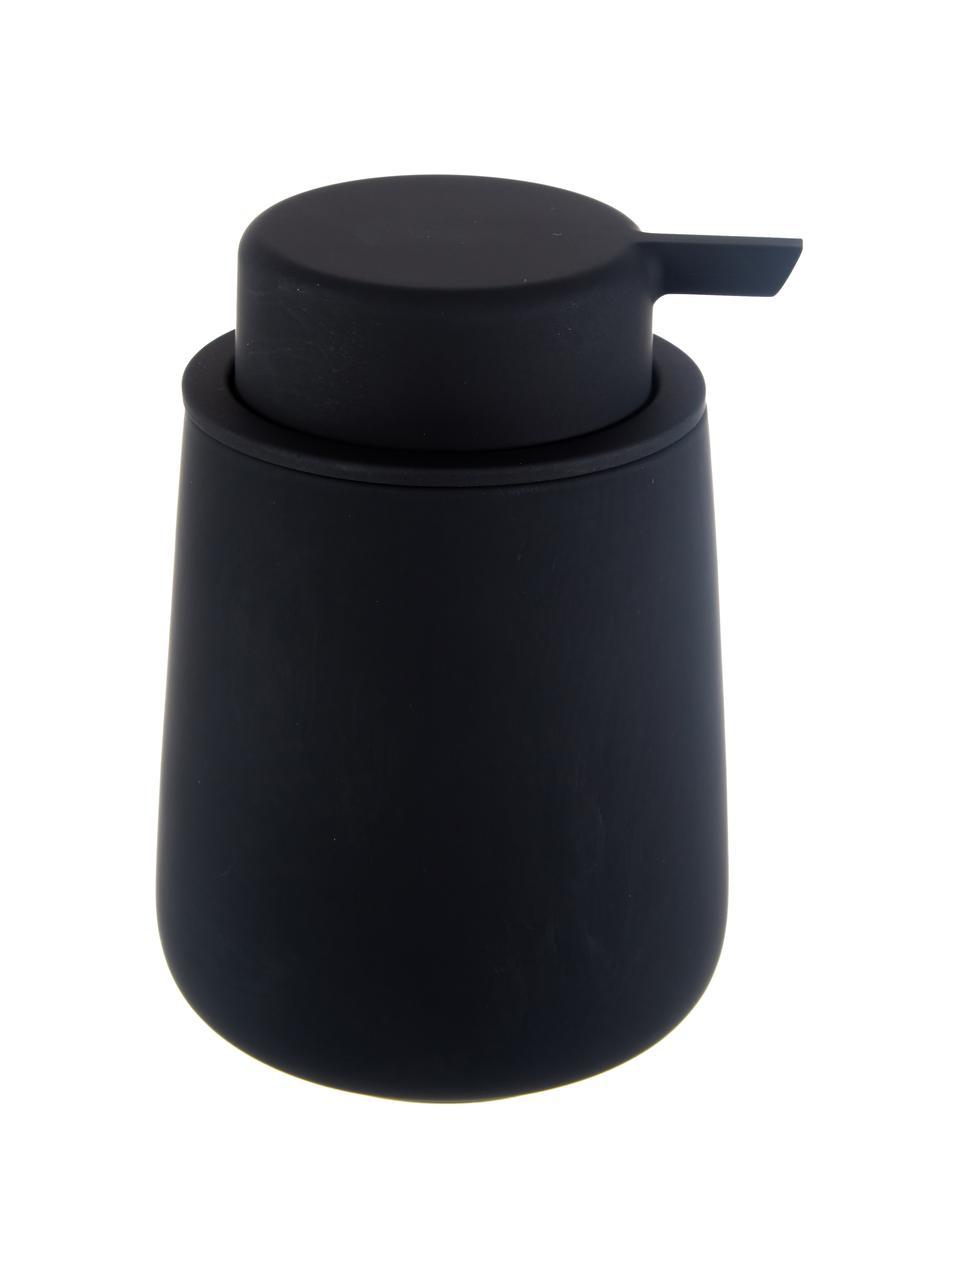 Dispenser sapone in porcellana Nova One, Contenitore: porcellana, Nero opaco, Ø 8 x Alt. 12 cm